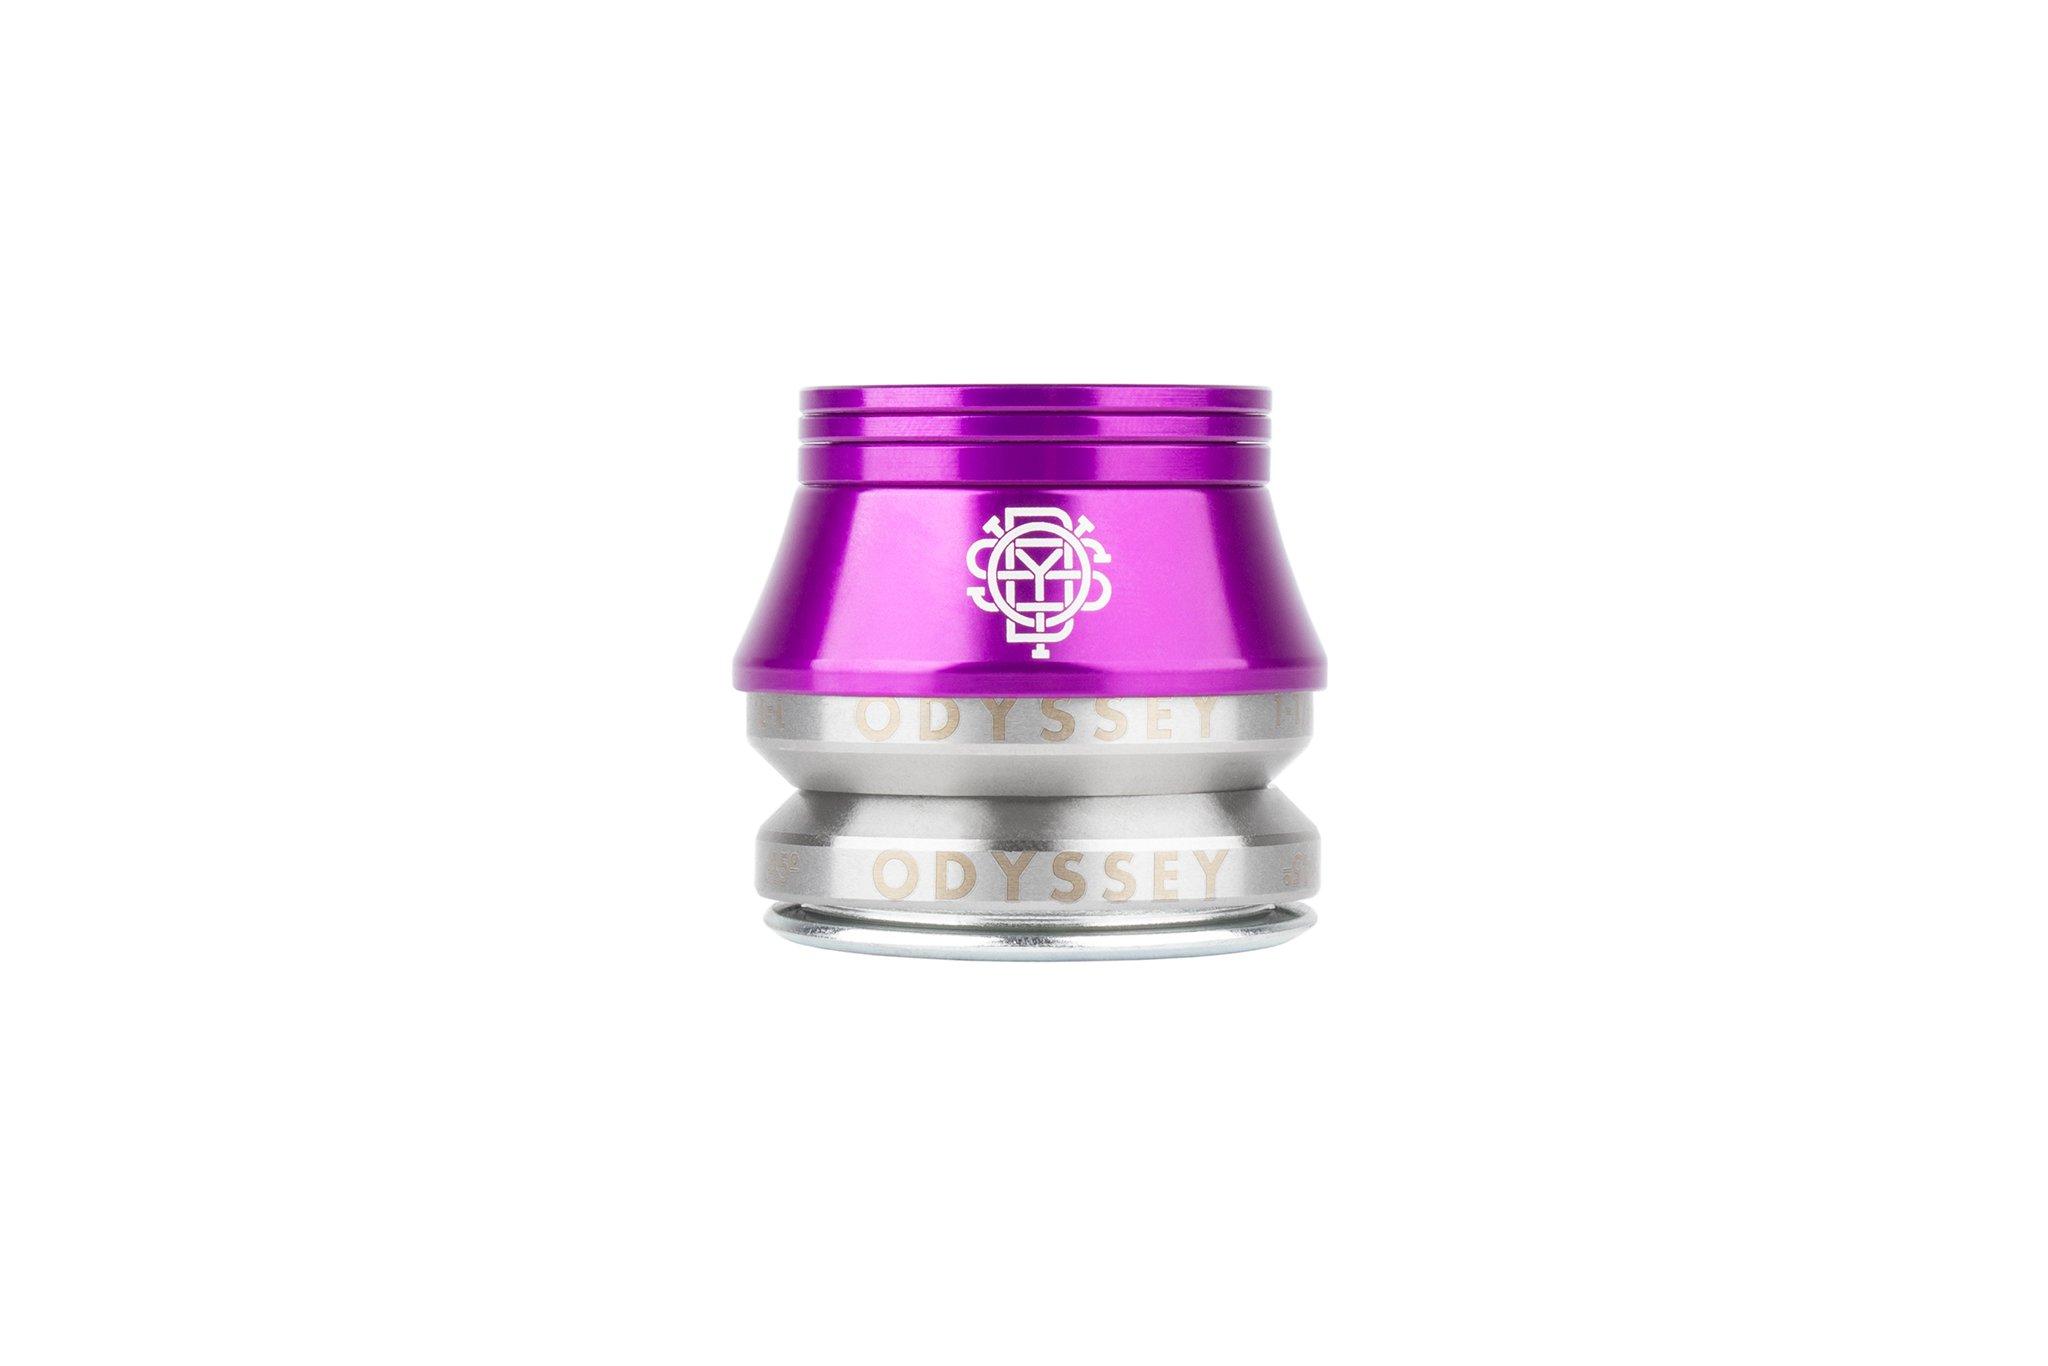 NEU: Odyssey BMX Pro Conical Headset in Anodized Purple